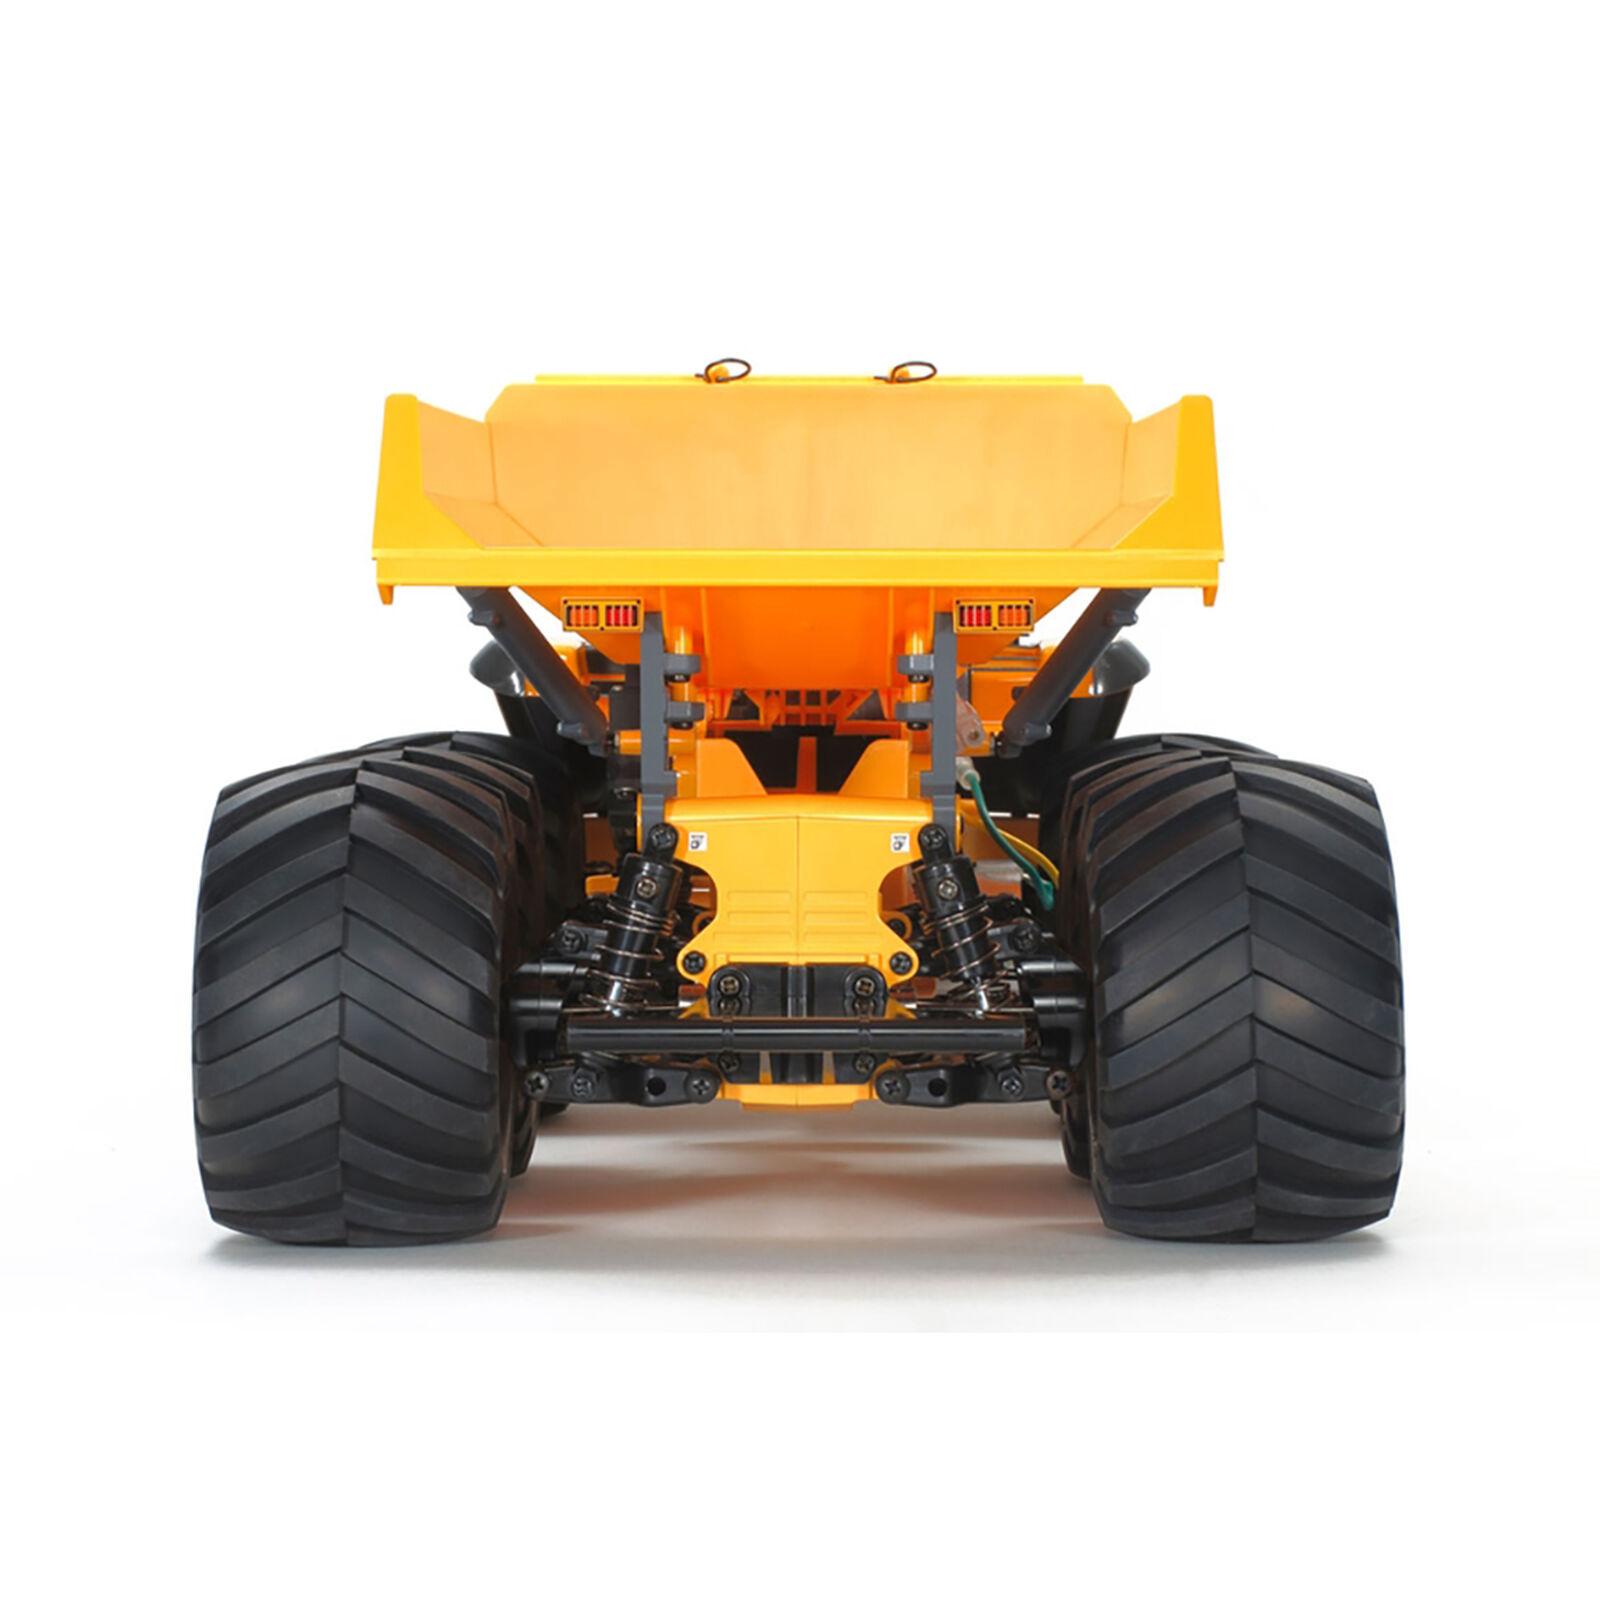 1/24 Volvo A60Y Hauler 6x6 G6-01 Semi Tractor Kit